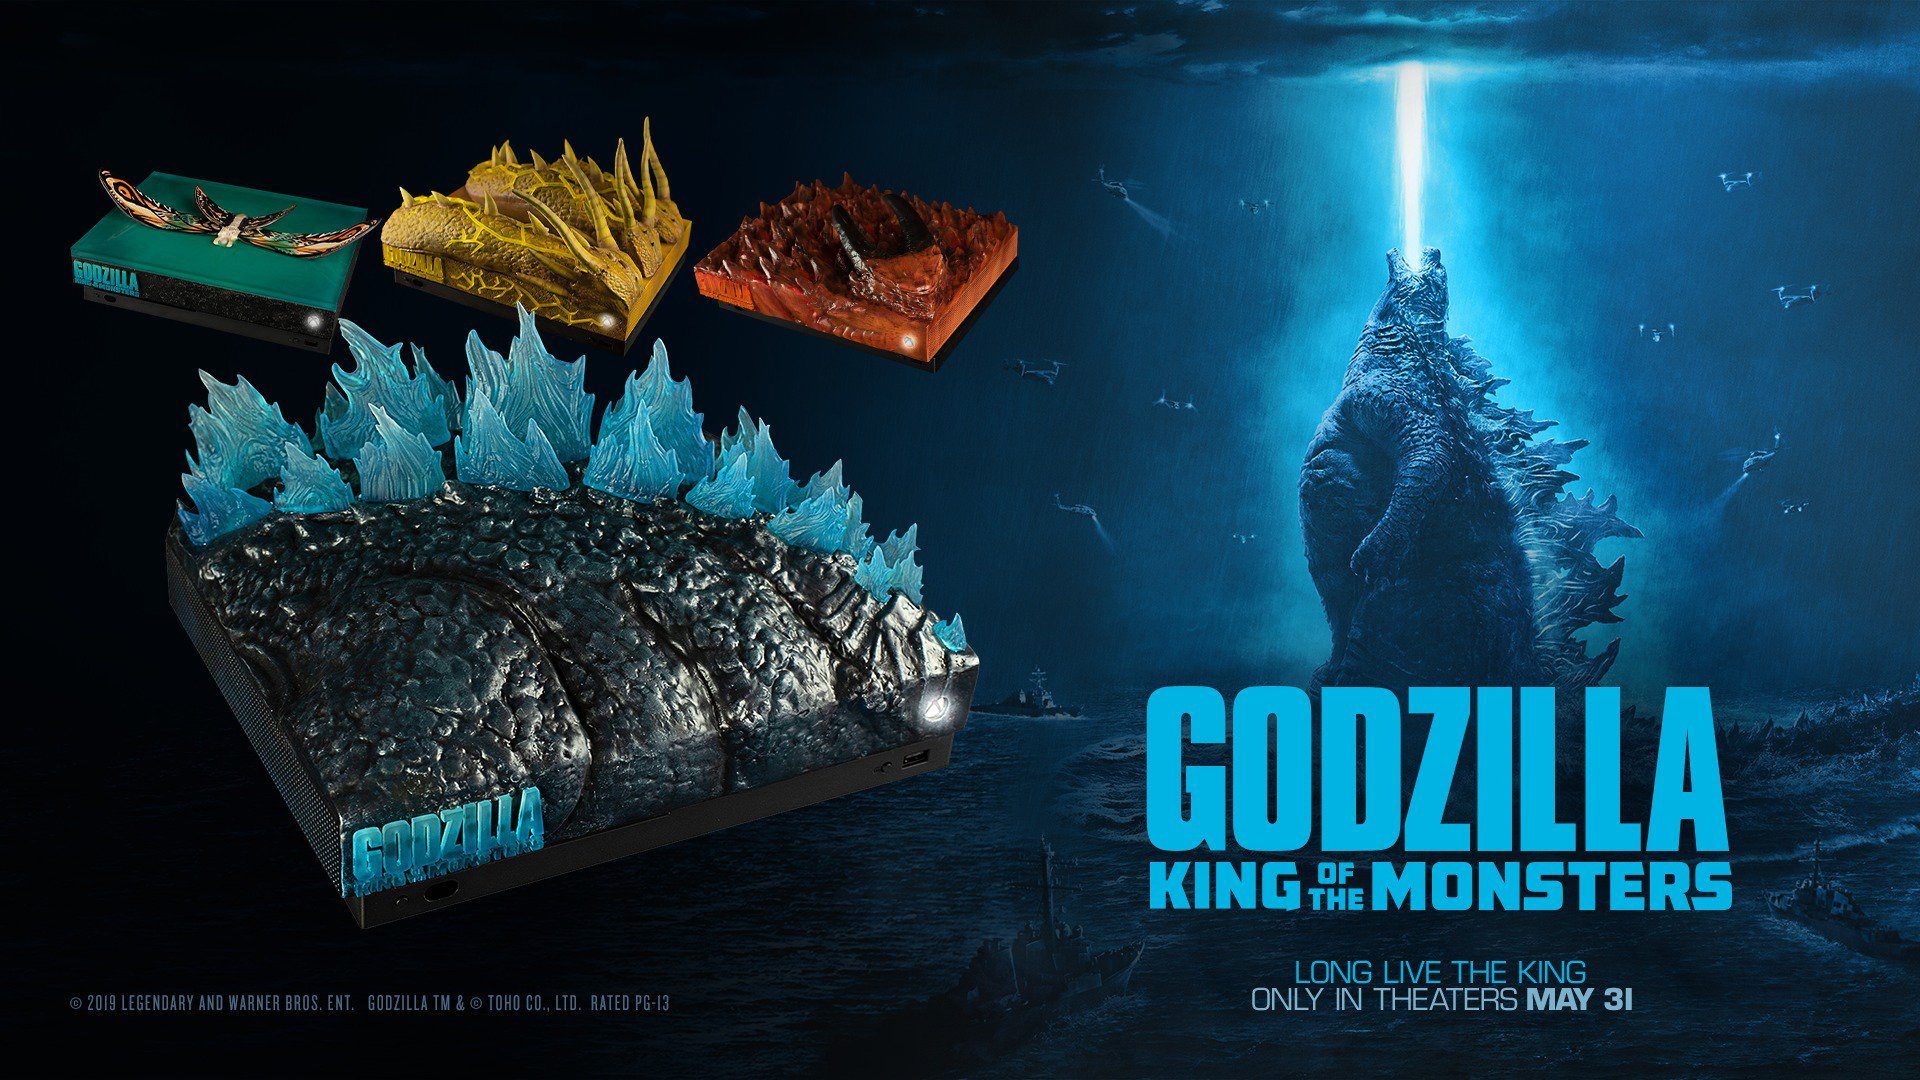 This Xbox One looks like a chunk of Godzilla screenshot